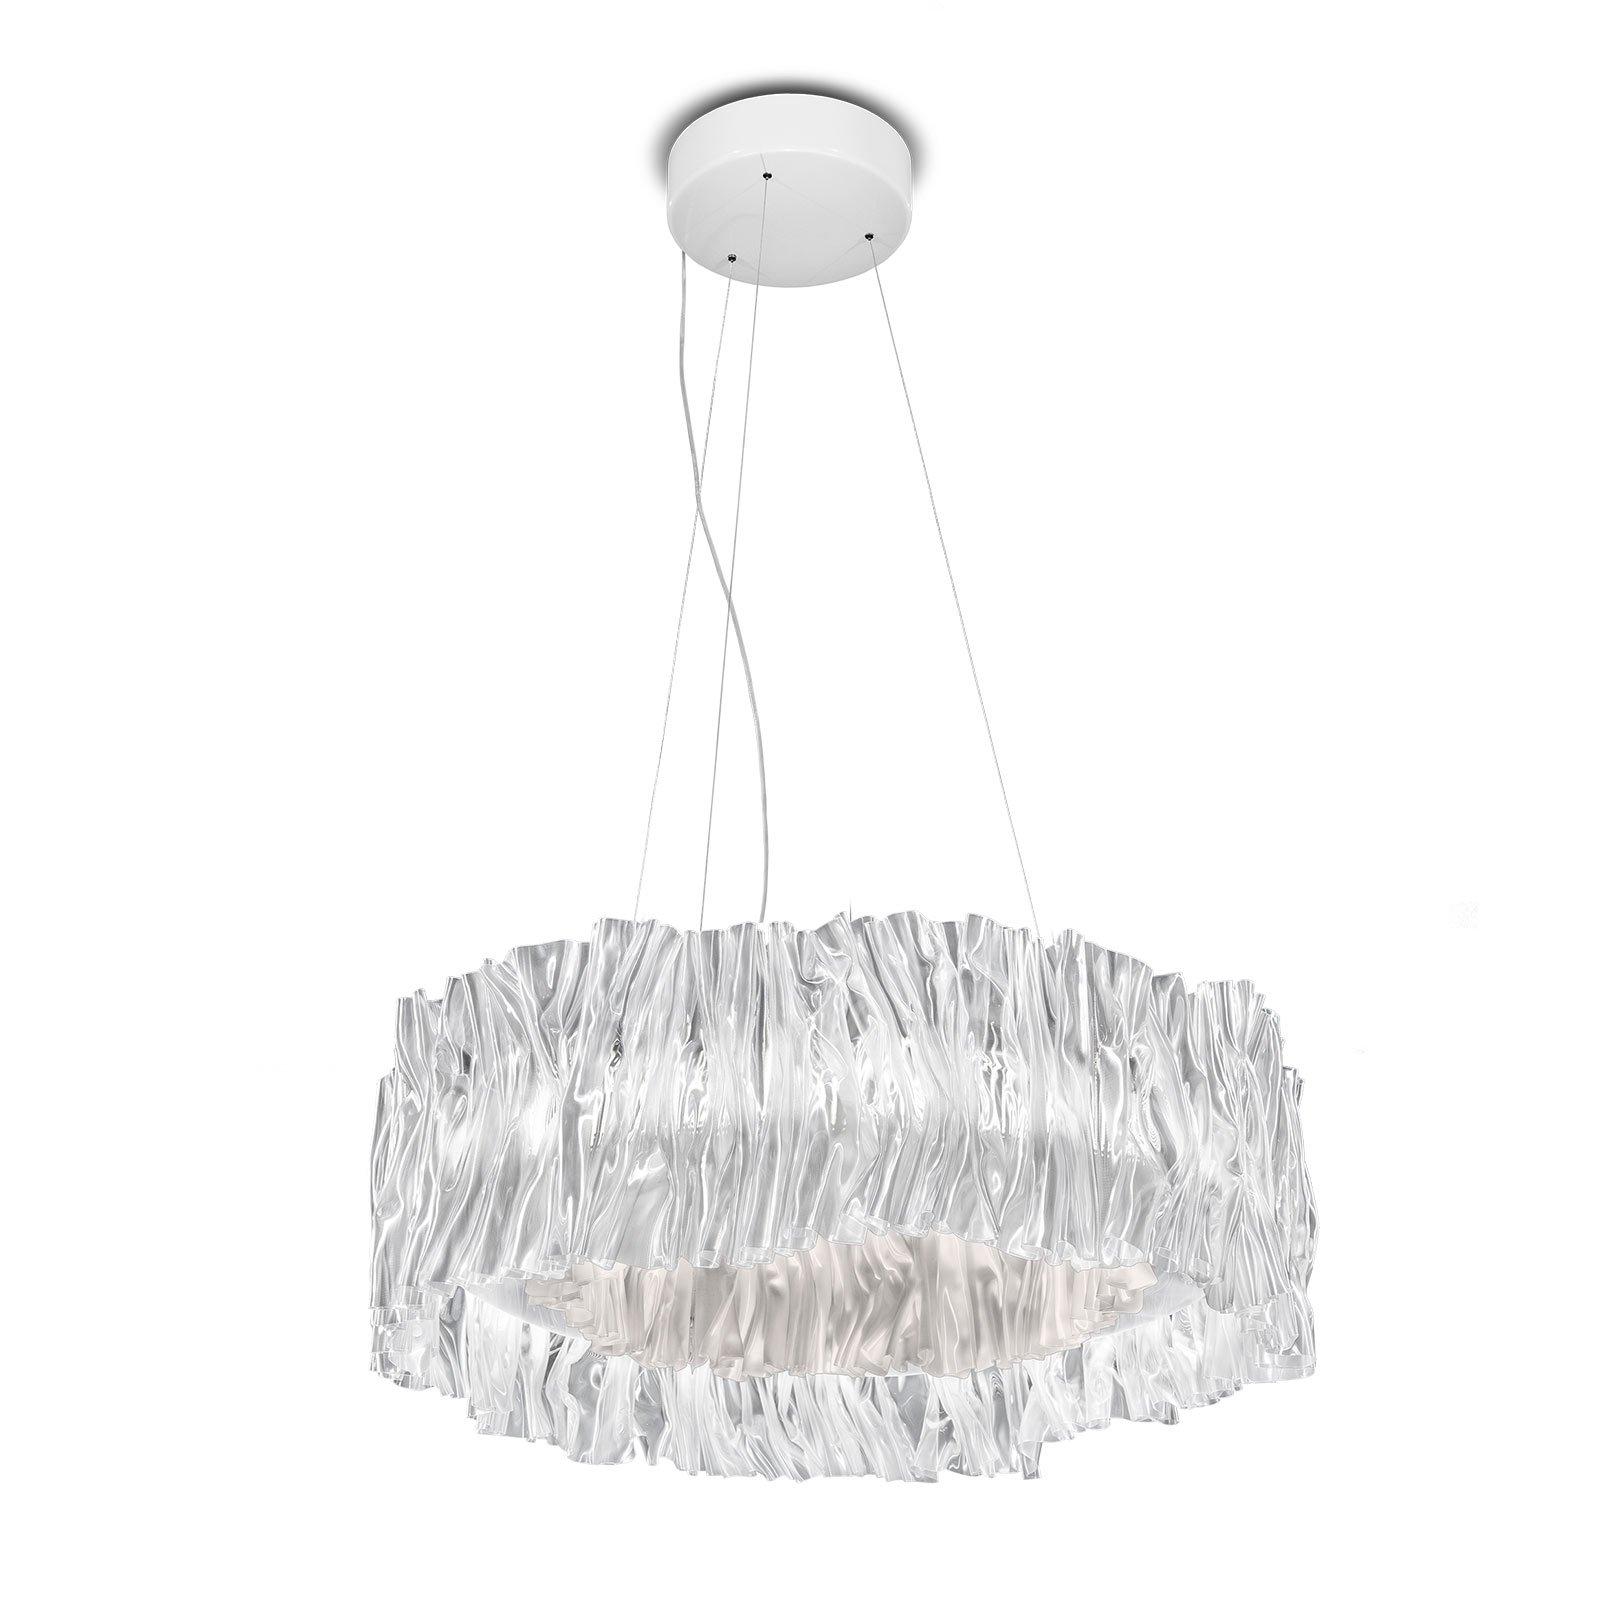 Slamp Accordéon LED-hengelampe hvit 3 000 K